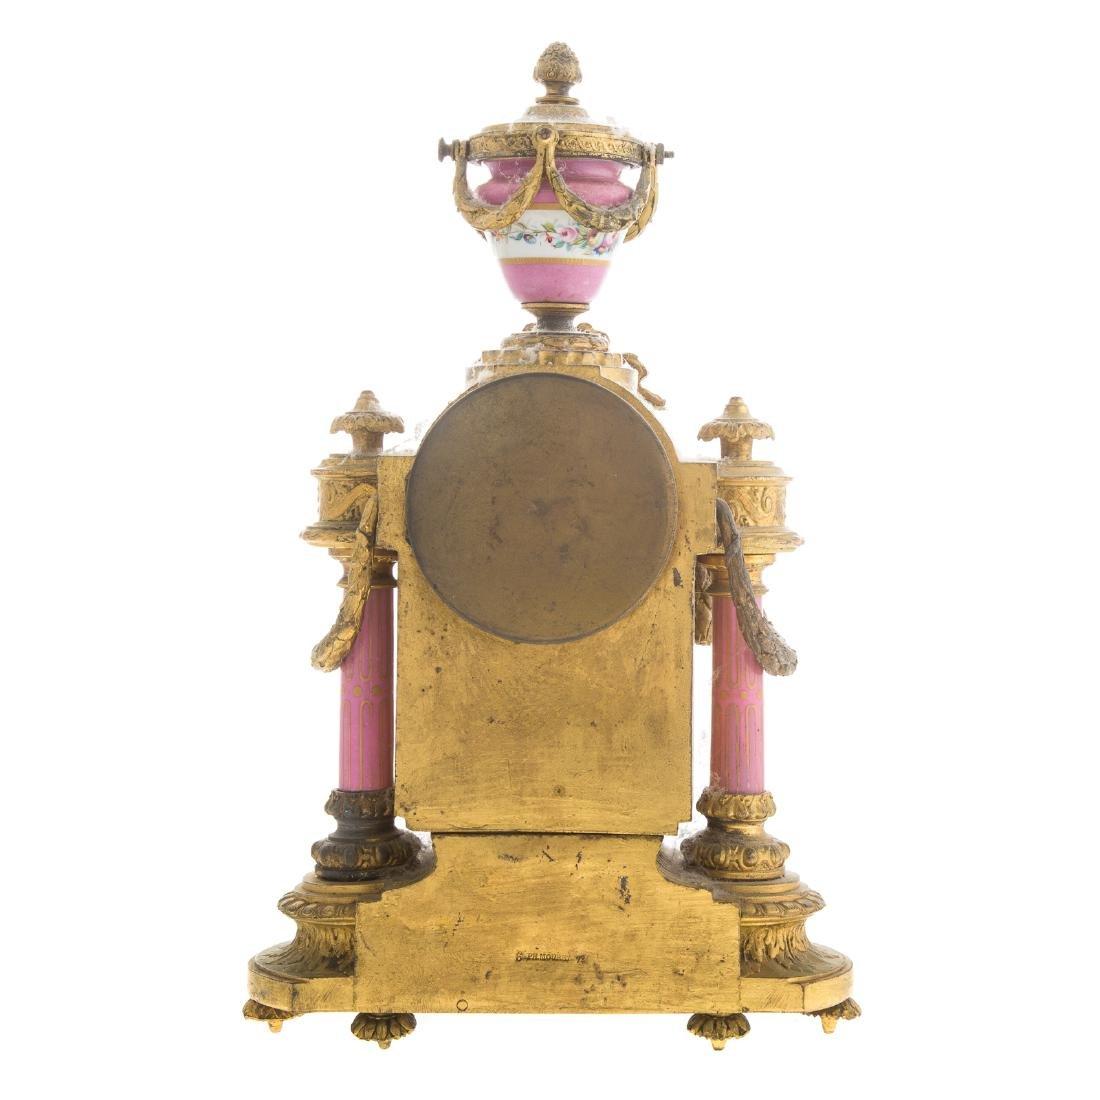 Phillipe H. Mourey gilt-metal clock garniture - 7